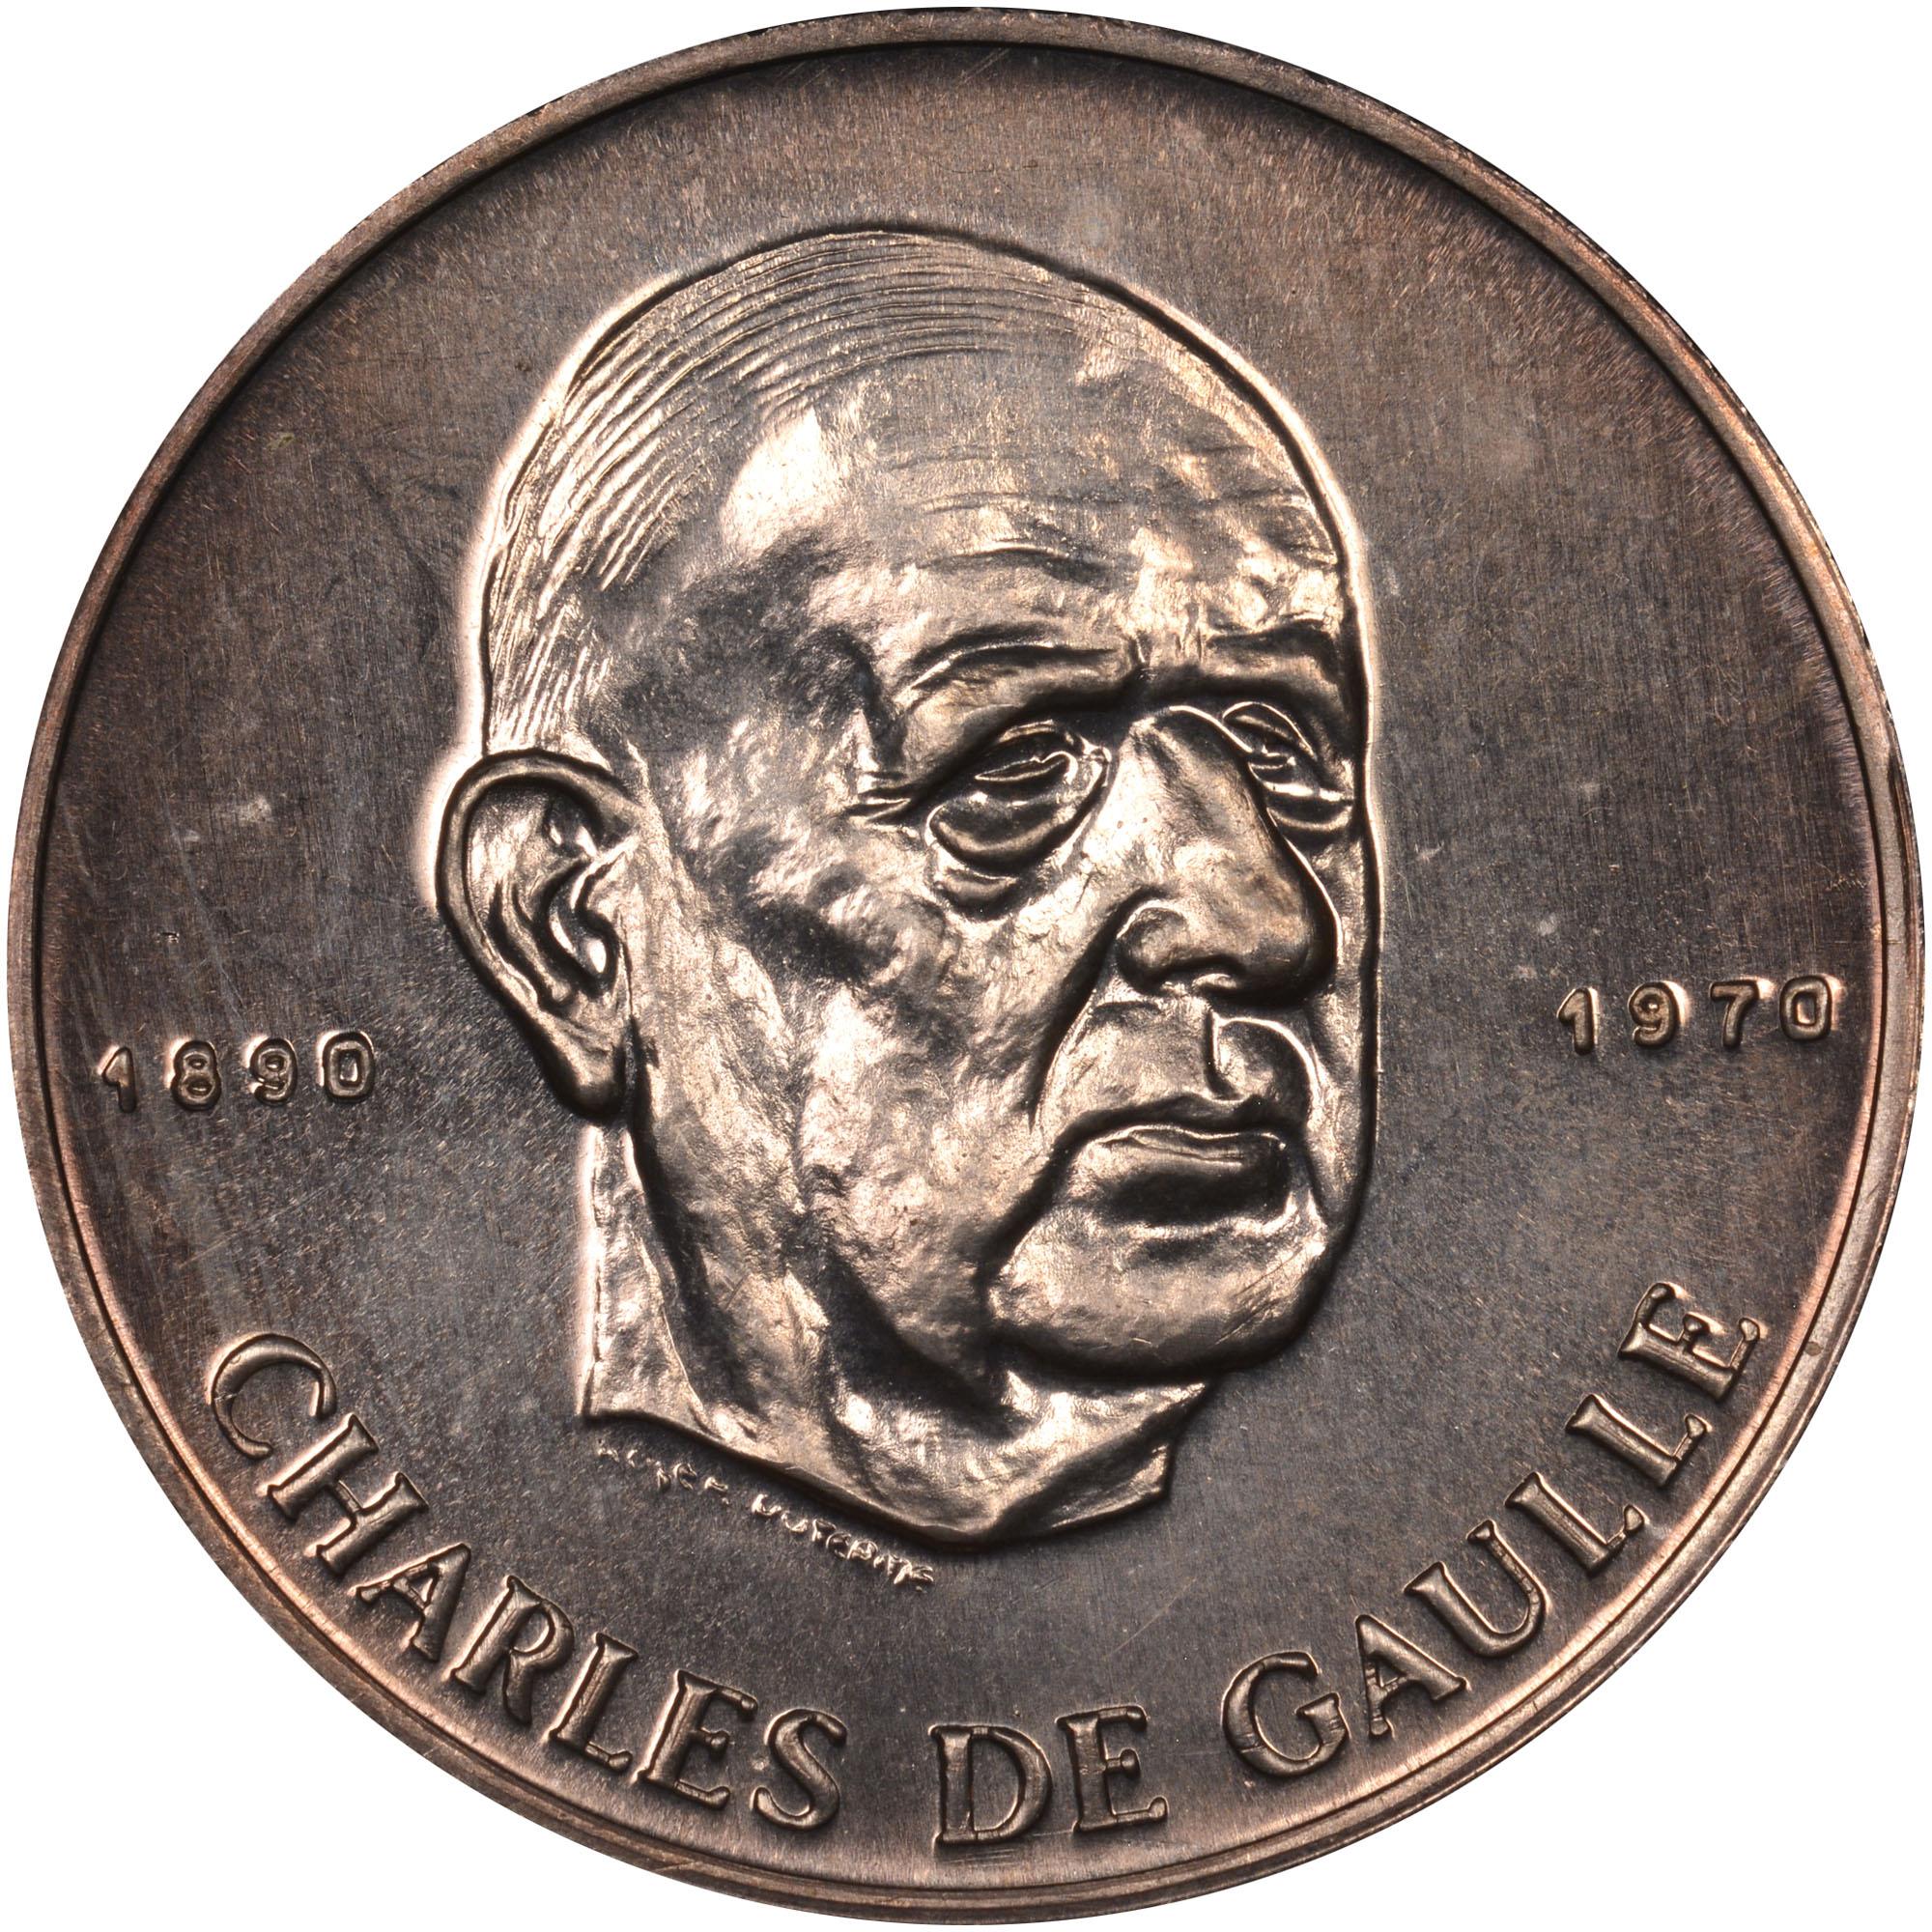 1970 Chad 200 Francs reverse